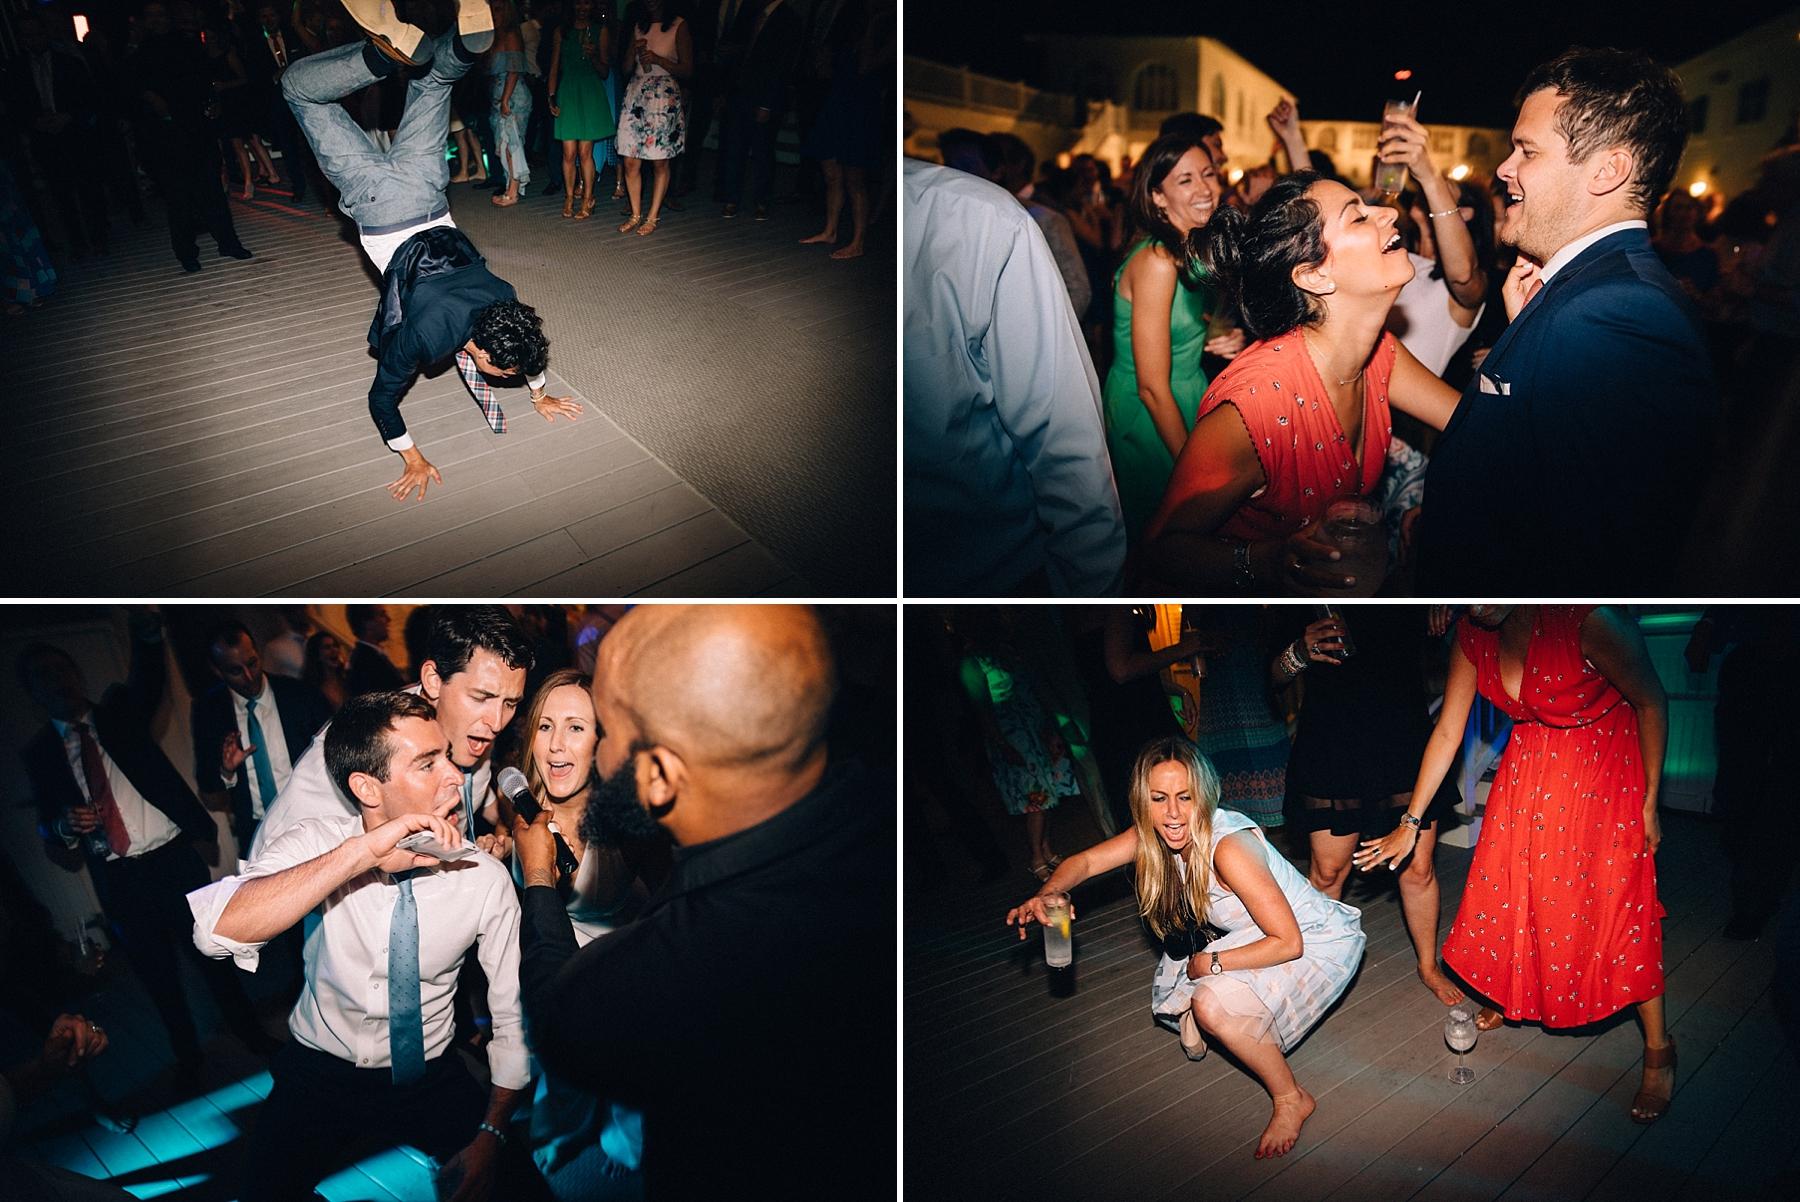 monmouth-beach-club-wedding-nj-photographer_0031.jpg